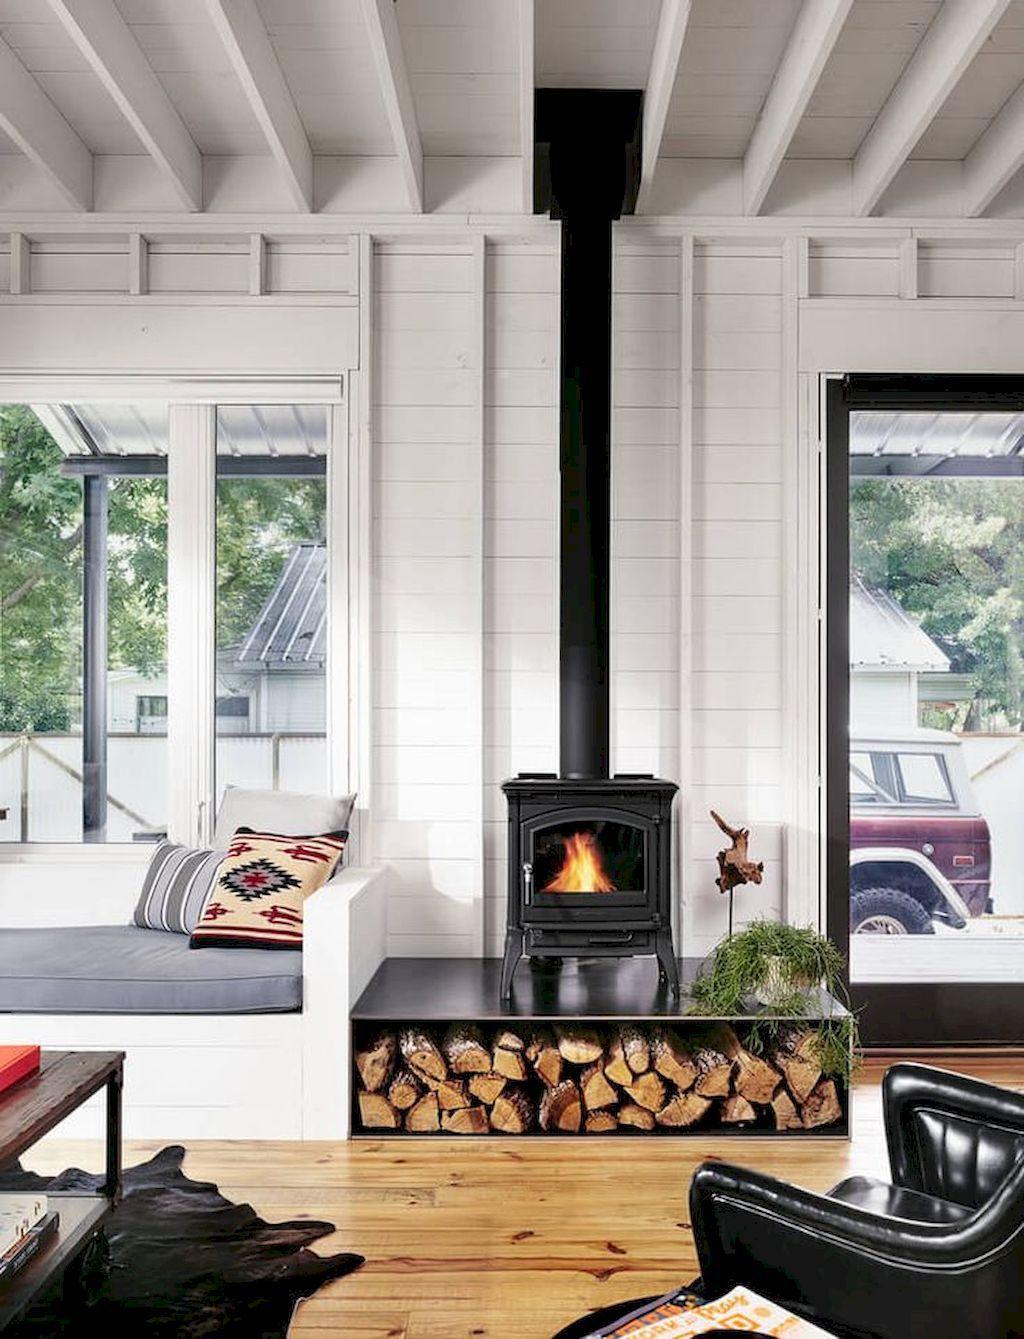 60 Scandinavian Fireplace Ideas For Your Living Room 64 Farm House Living Room Modern Farmhouse Living Room Decor Farmhouse Decor Living Room